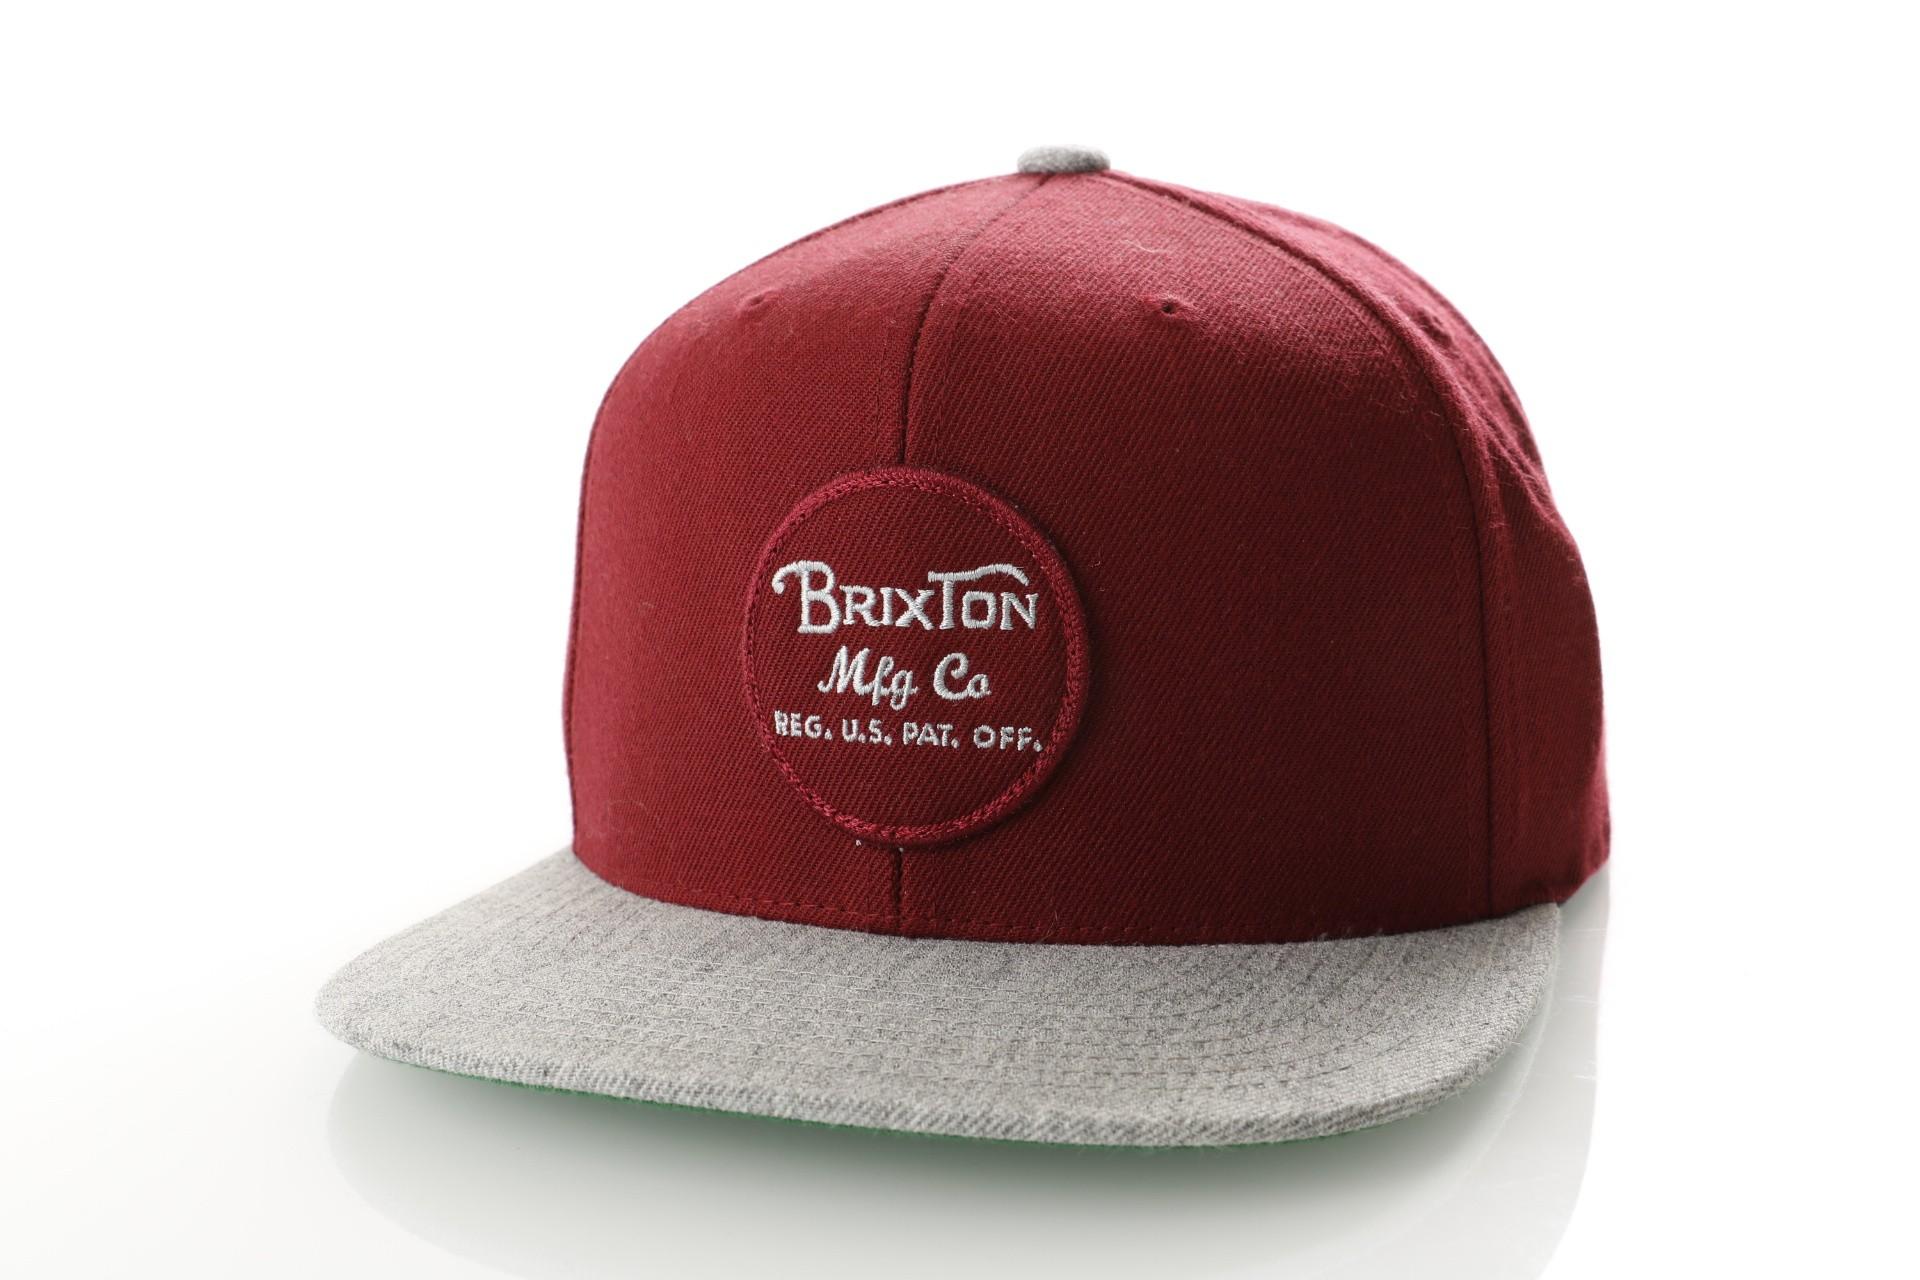 Foto van Brixton WHEELER SNAPBACK 375 snapback cap BURGUNDY/BURGUNDY/HEATHER GREY